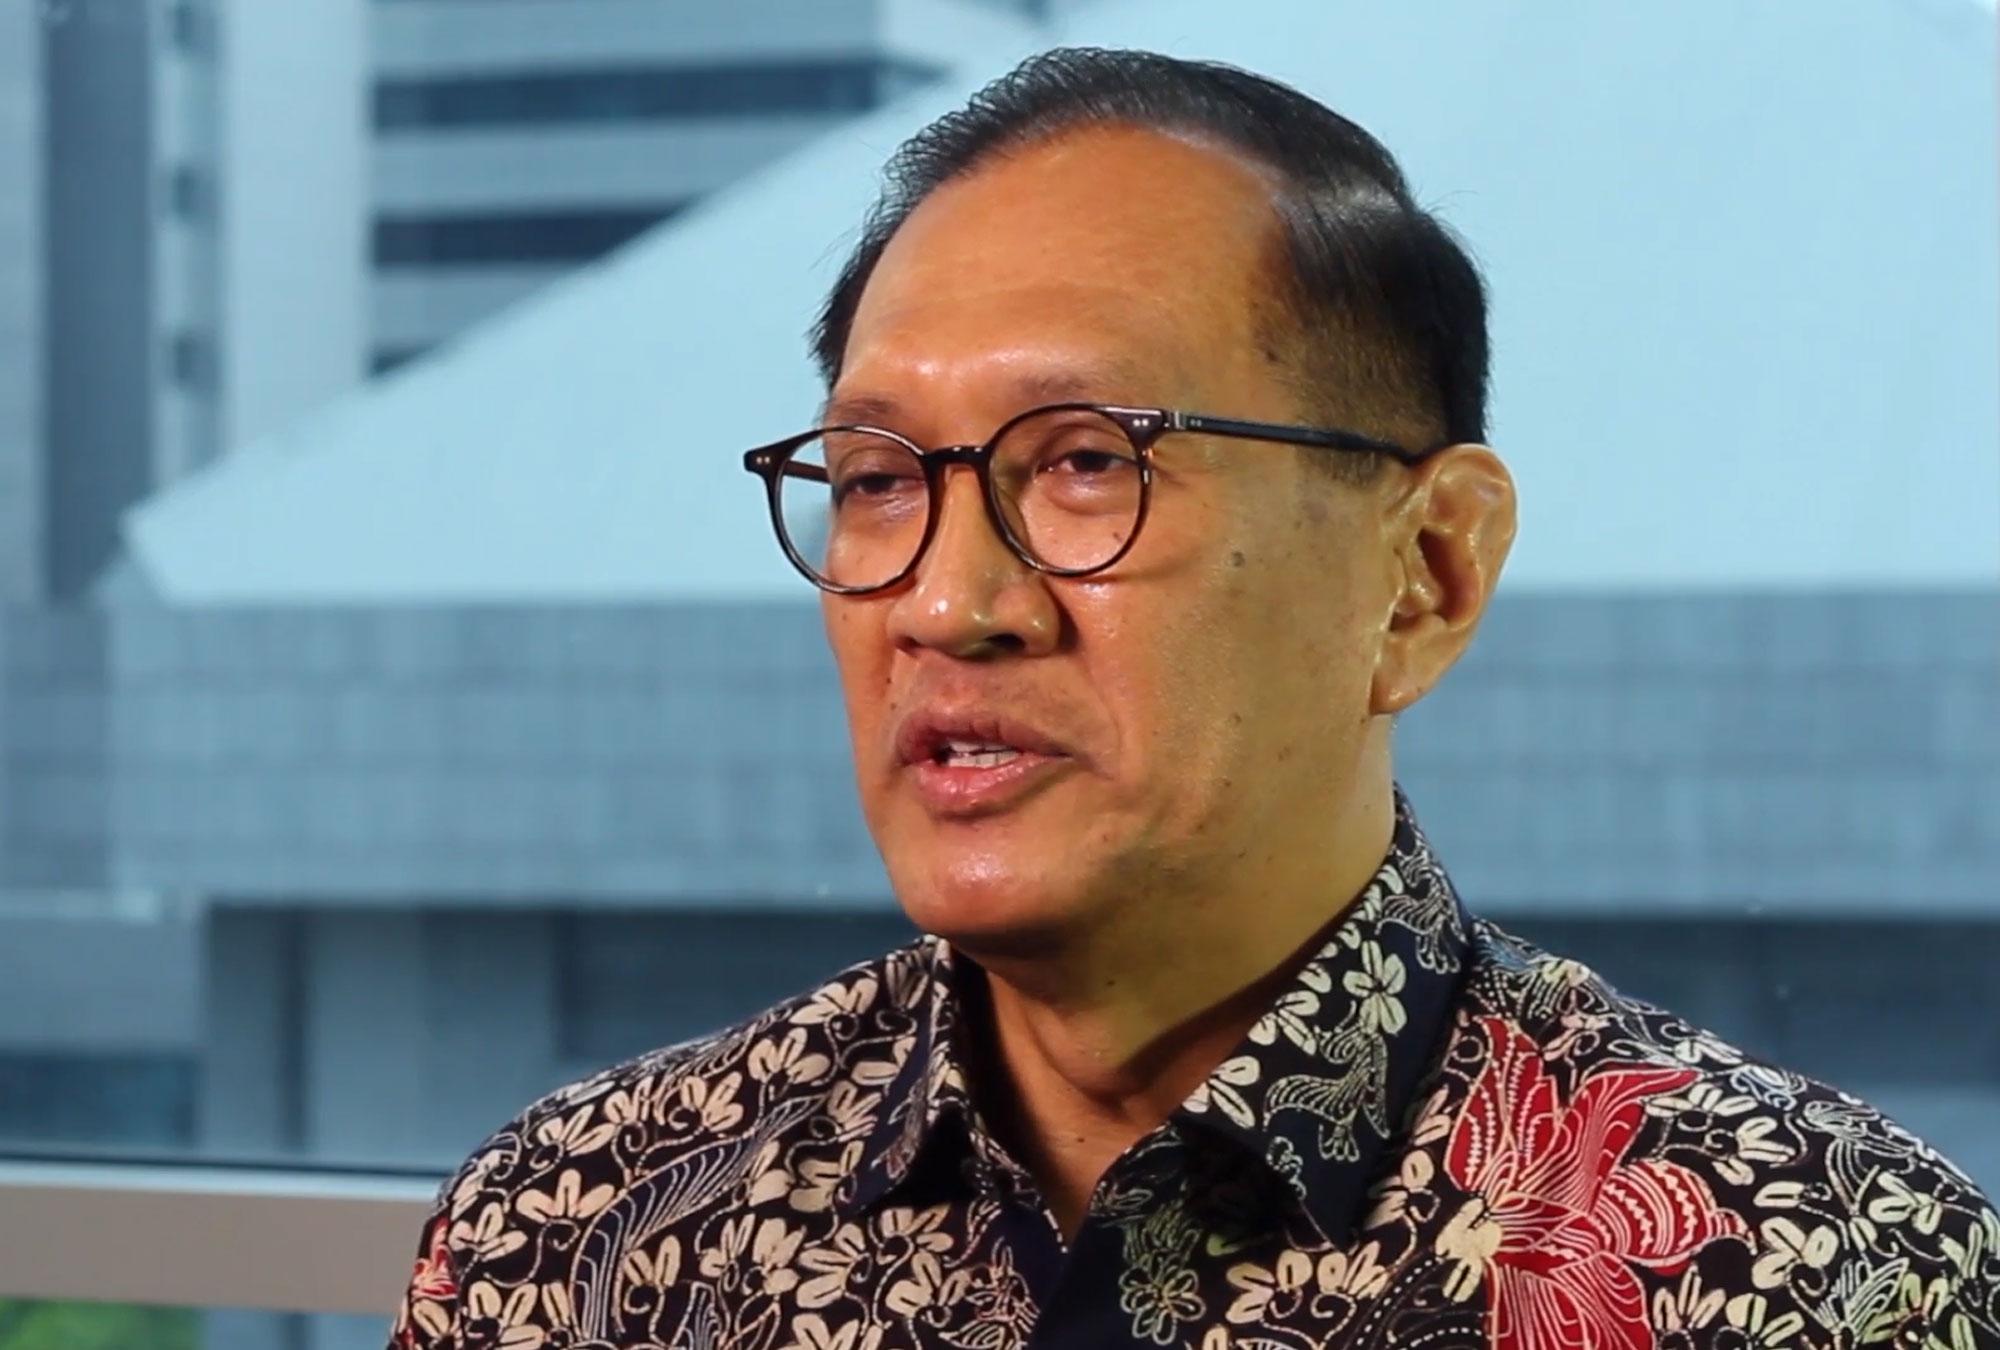 Bambang Widianto being interviewed